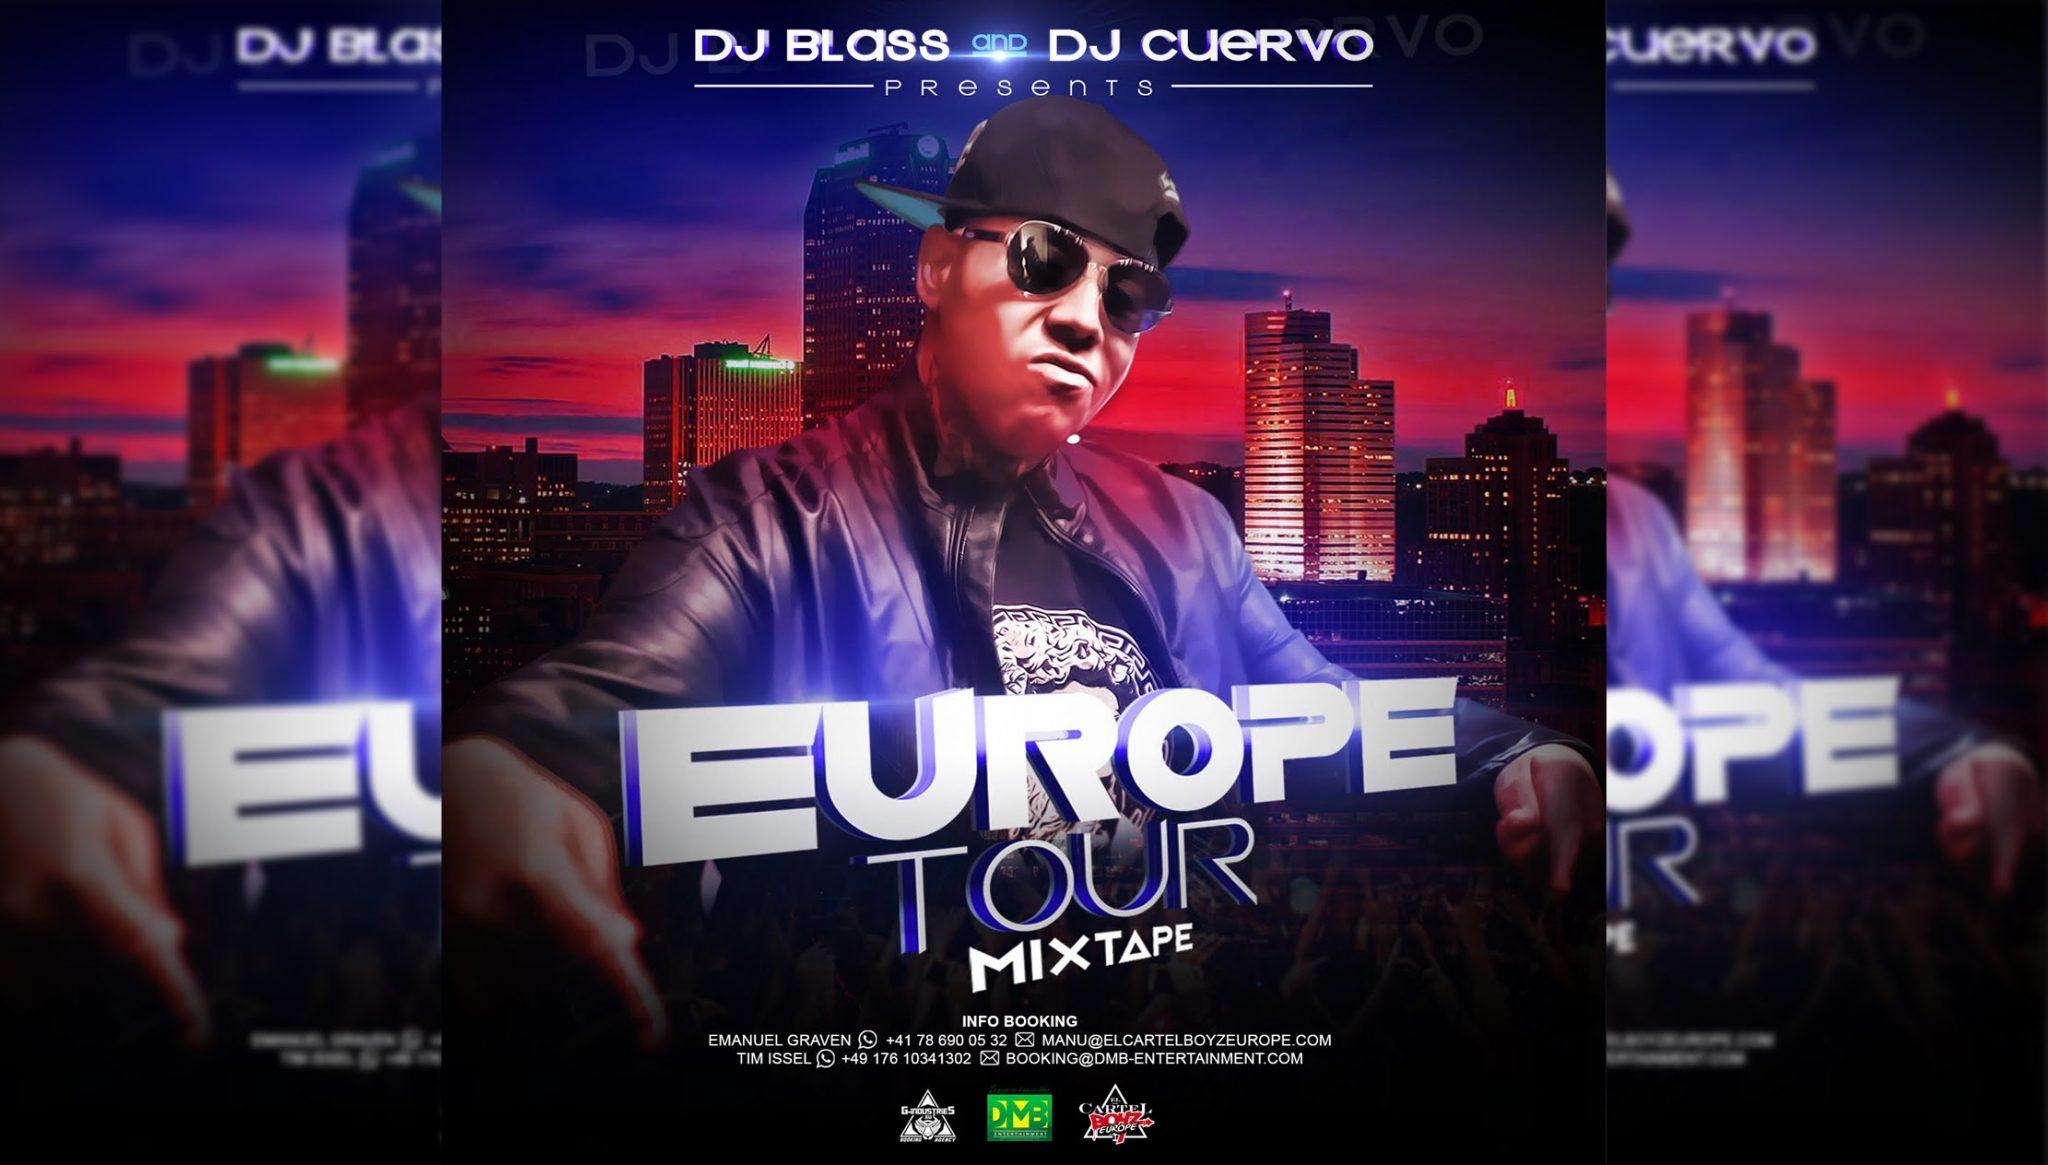 dj blass y dj cuervo presentan e - Dj Blass y Dj Cuervo Presentan - Europe Tour Mixtape (2016)